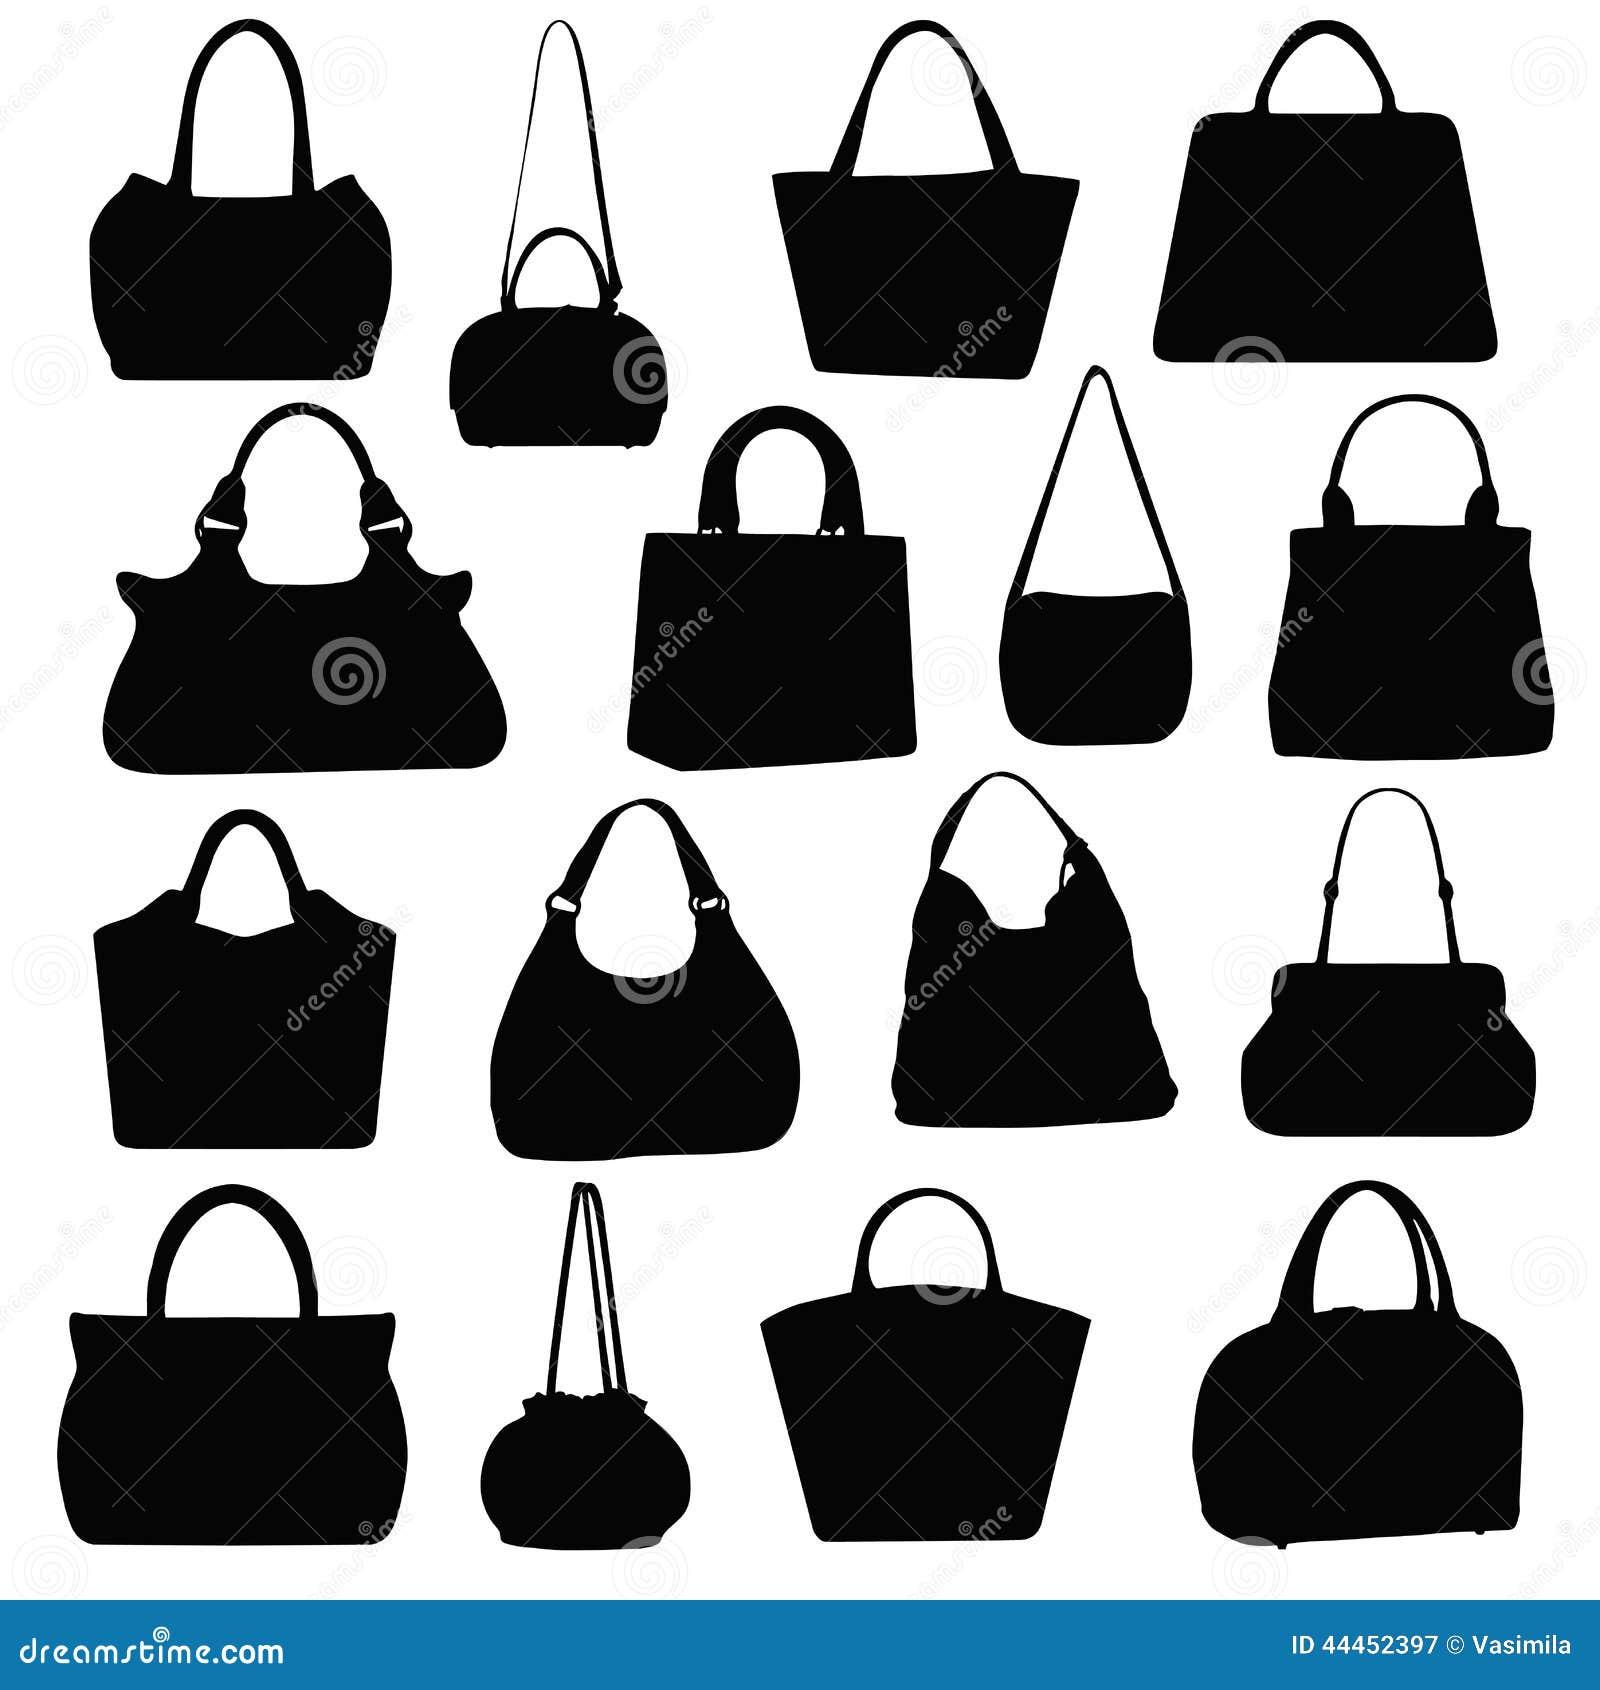 handtaschen vektor abbildung bild 44452397. Black Bedroom Furniture Sets. Home Design Ideas